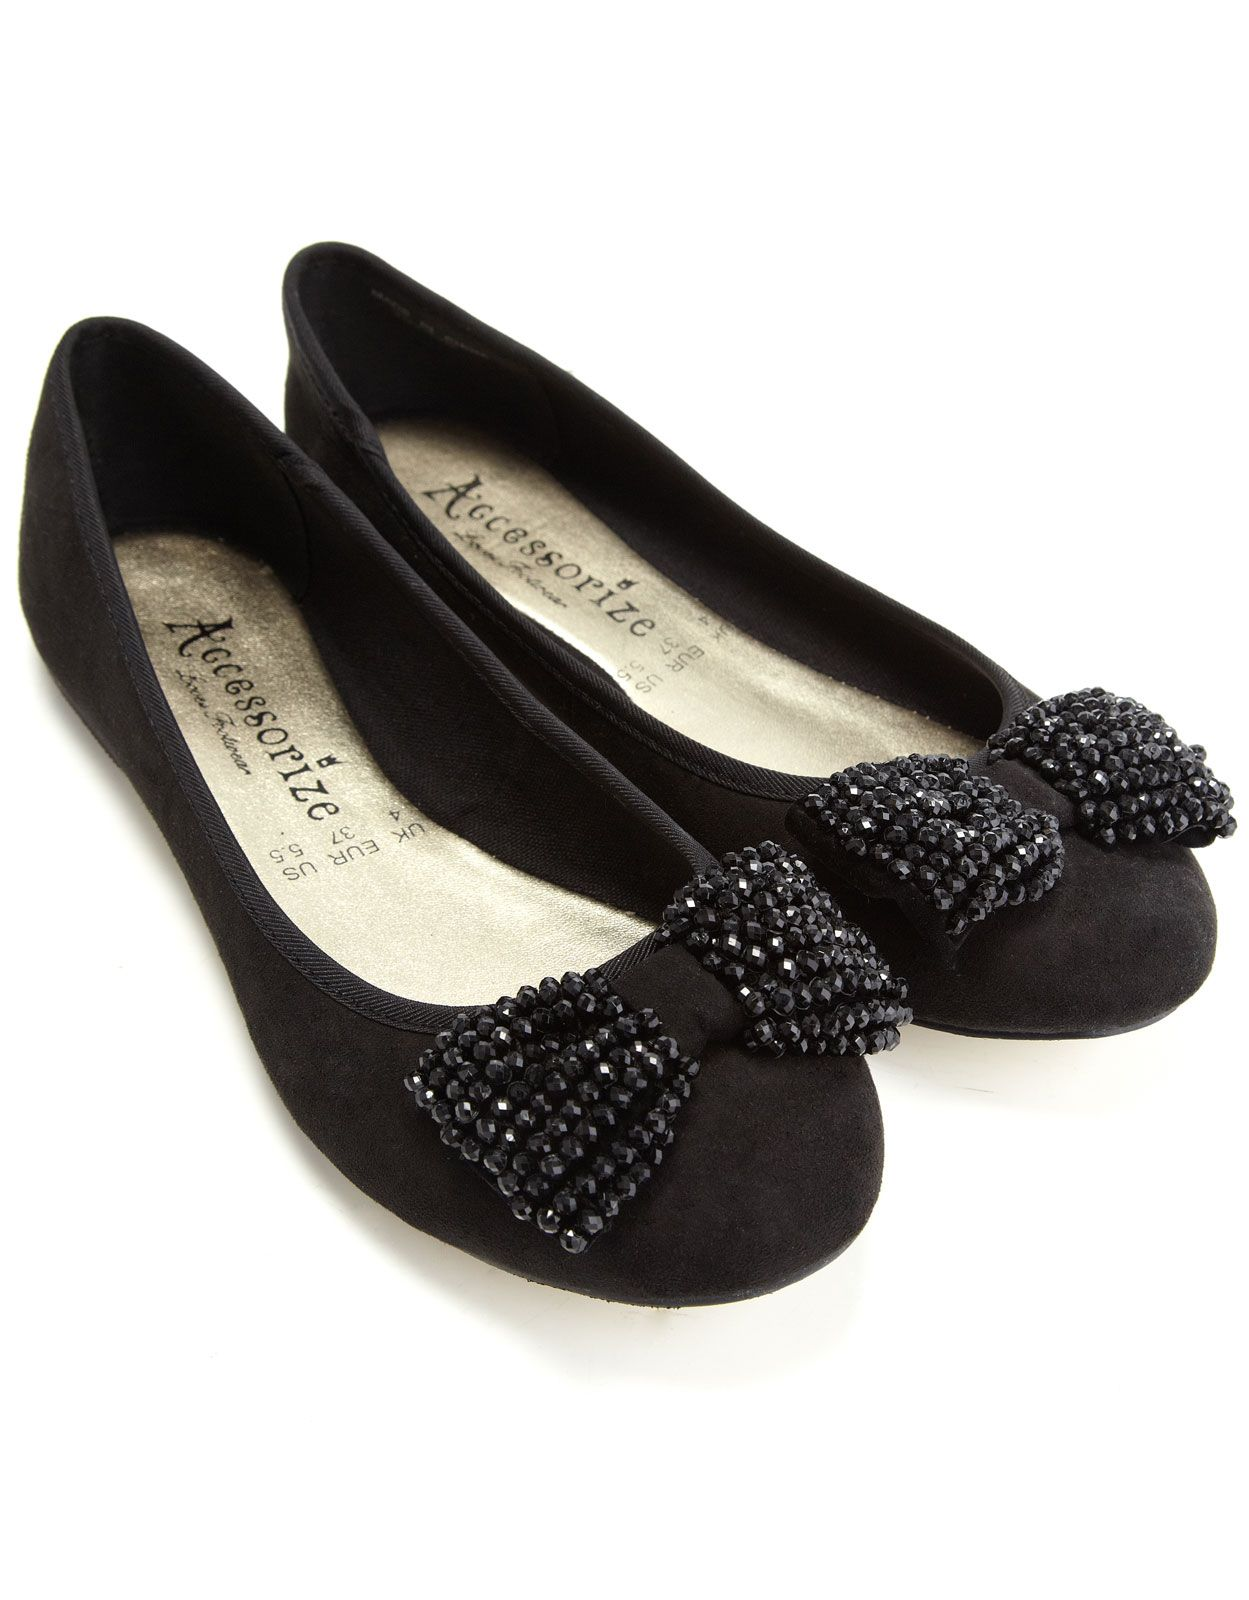 Sparkle shoes, Jeweled shoes, Bow flats